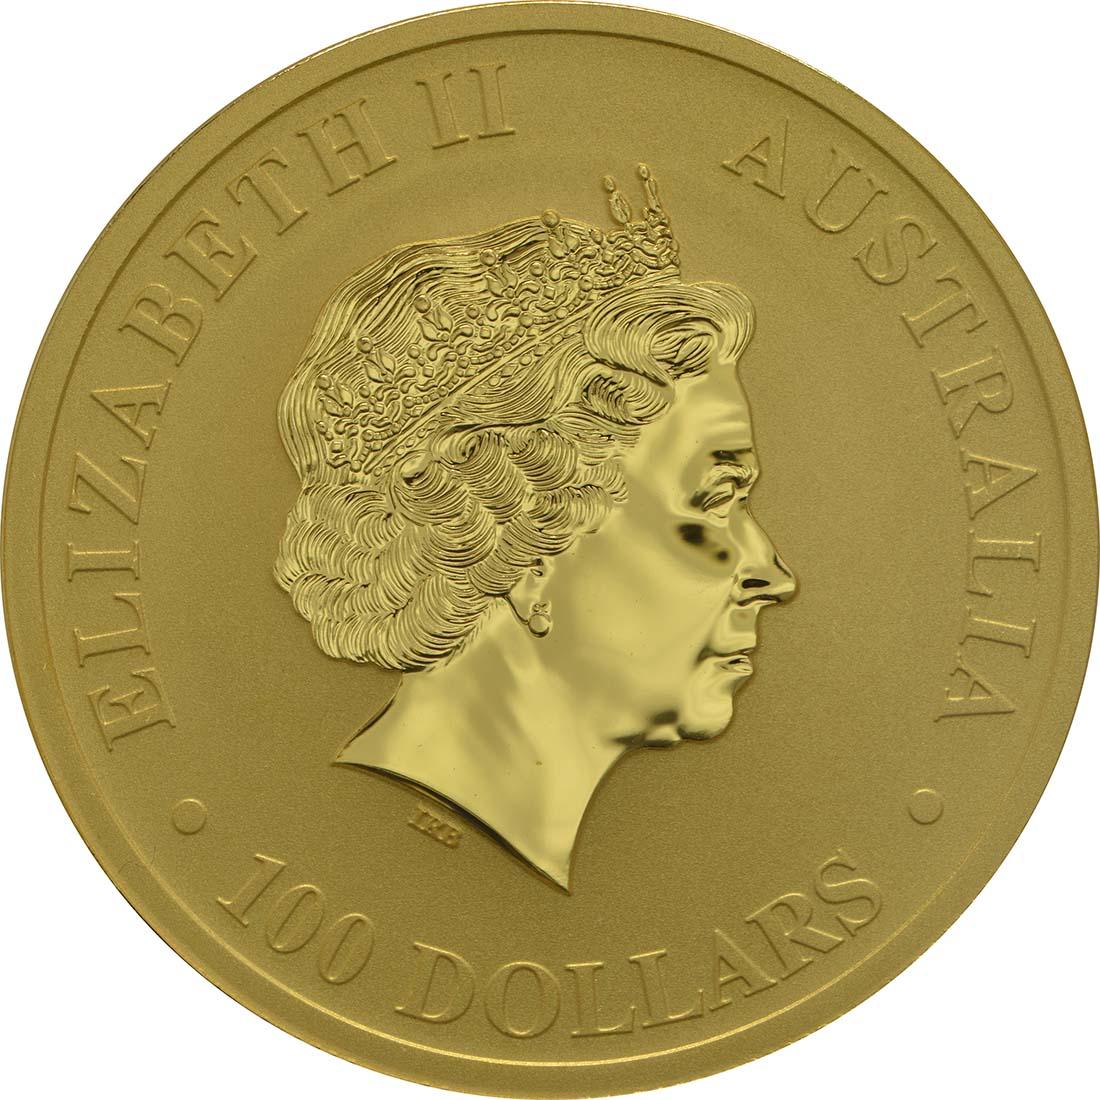 australien 100 dollar kaenguru nugget 1 unze feingold div gold stgl 1132 euro. Black Bedroom Furniture Sets. Home Design Ideas